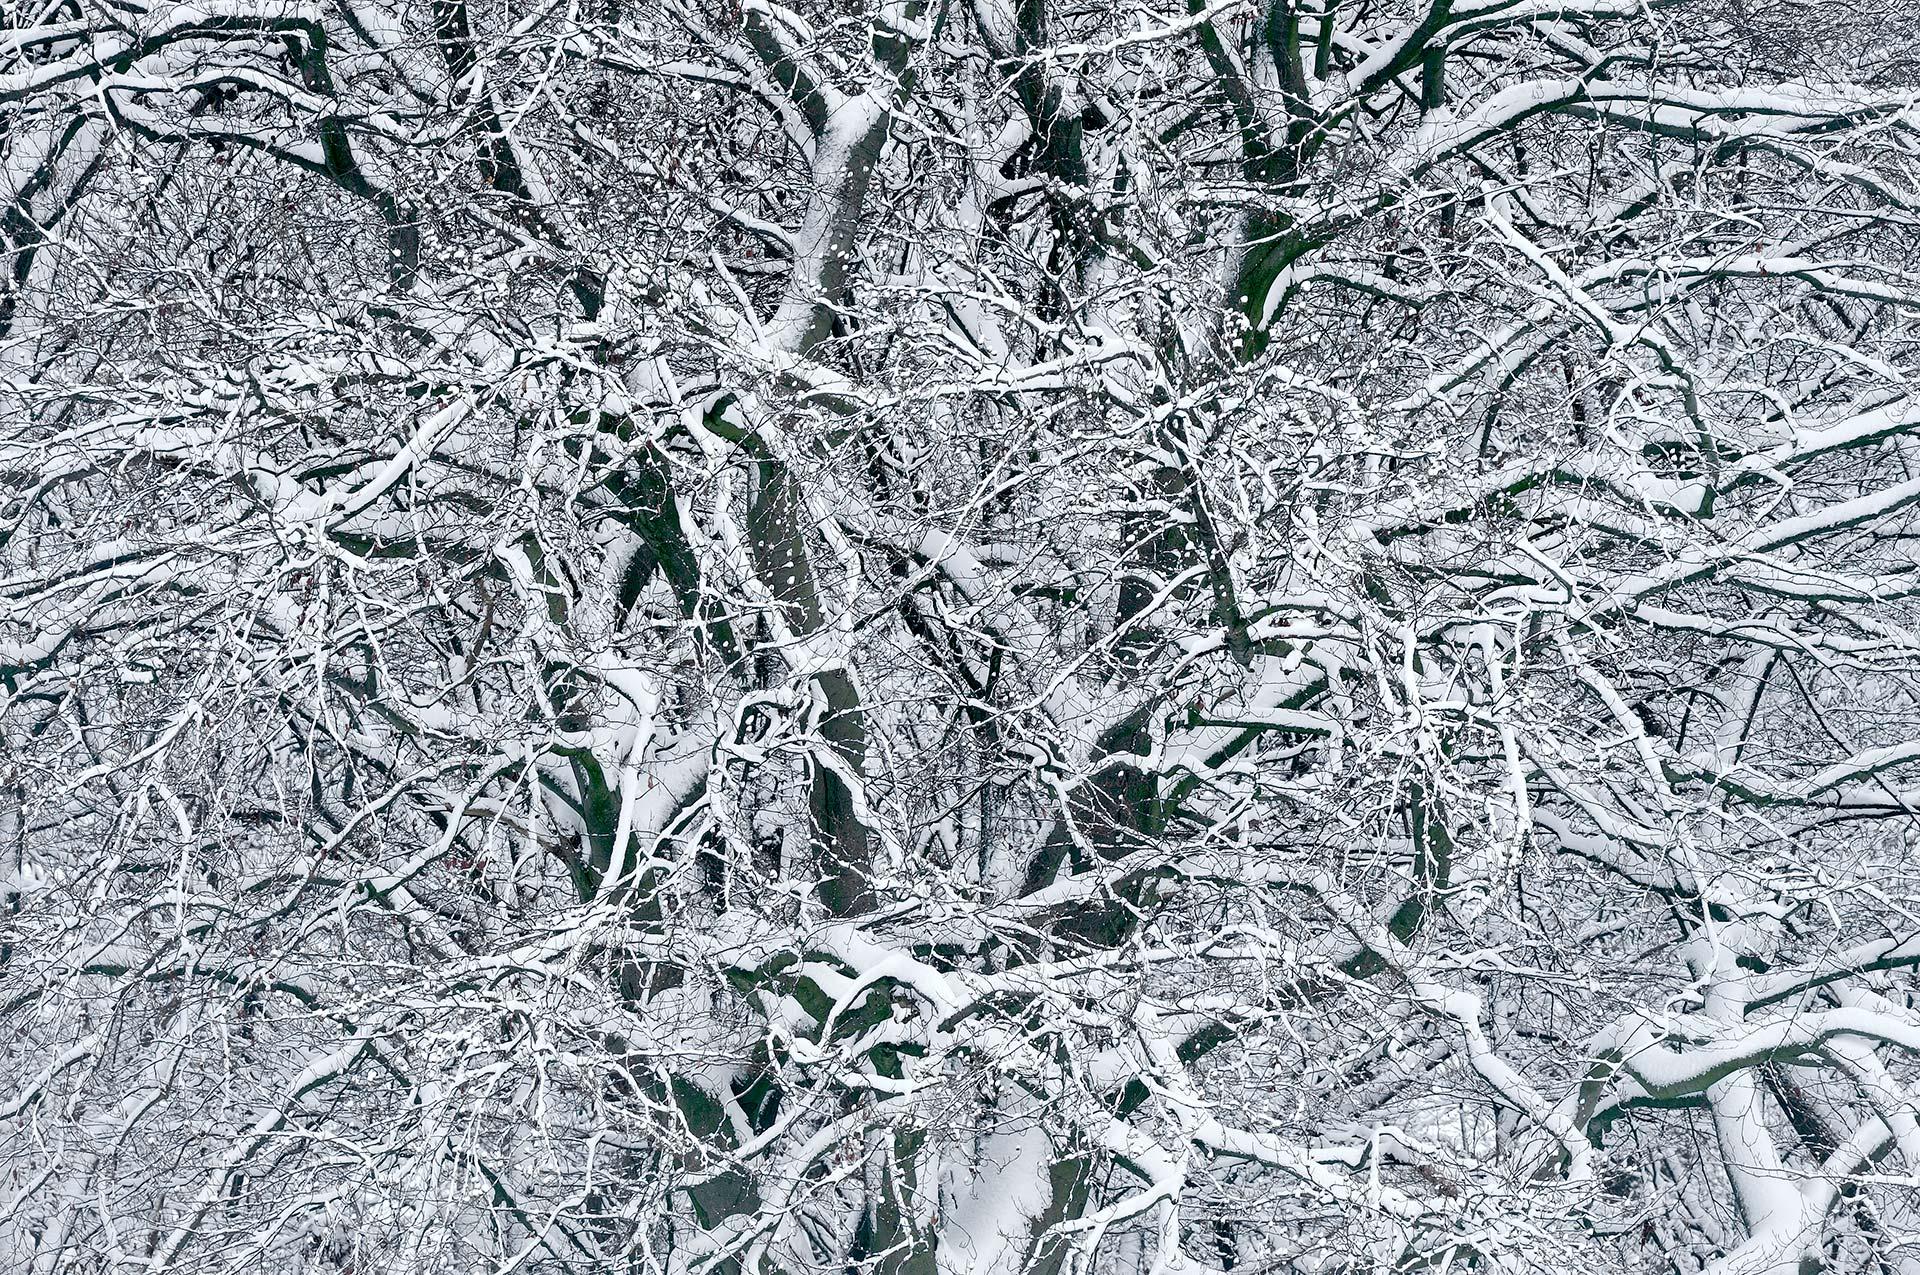 Snow covered beech tree